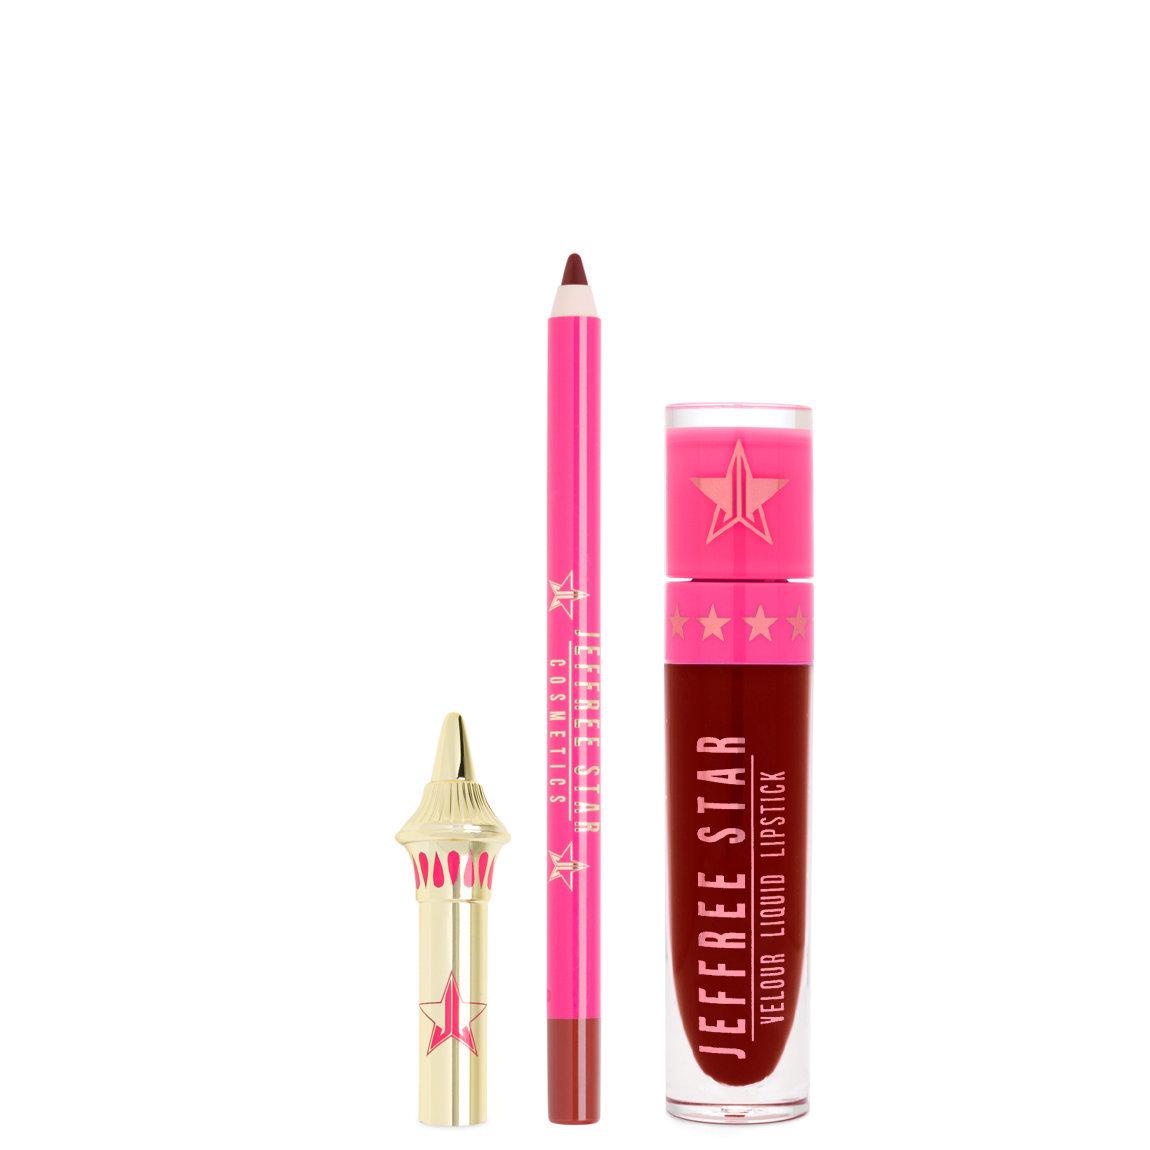 Jeffree Star Cosmetics Velour Lip Kit Unicorn Blood alternative view 1.